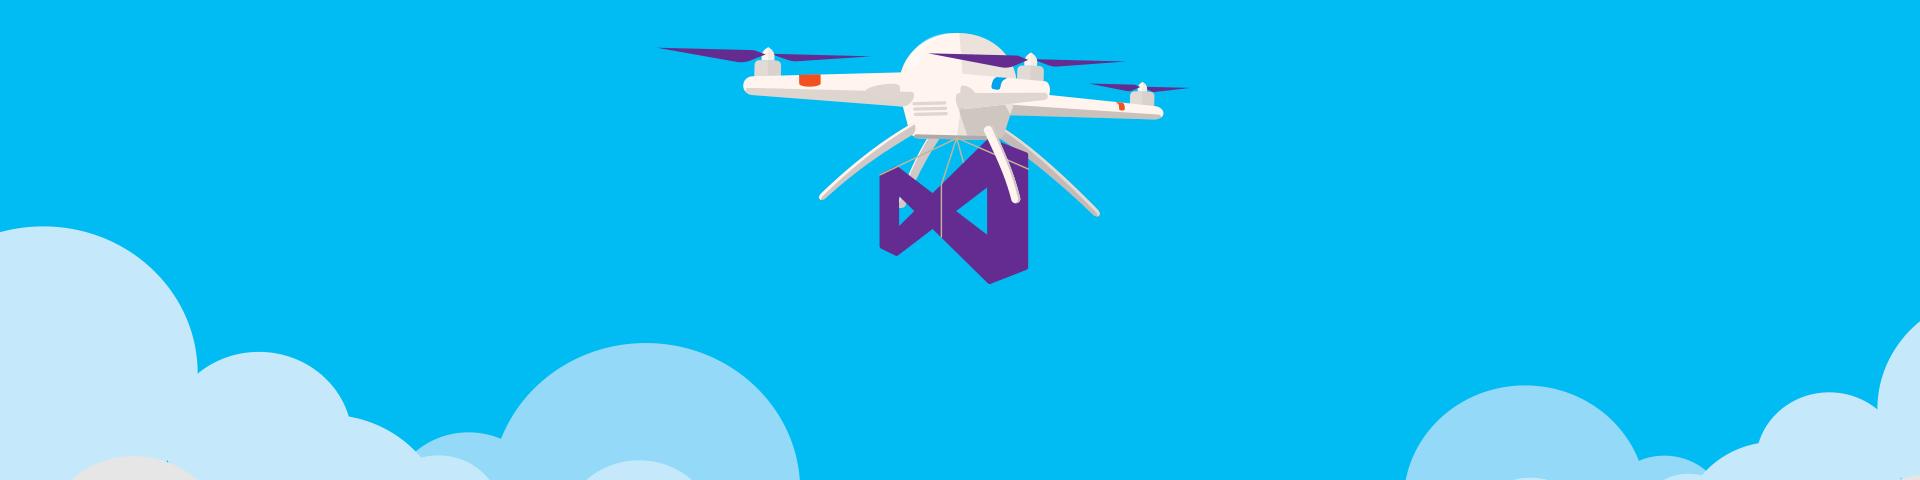 Ilustracja z dronem lecącym z logo Visual Studio